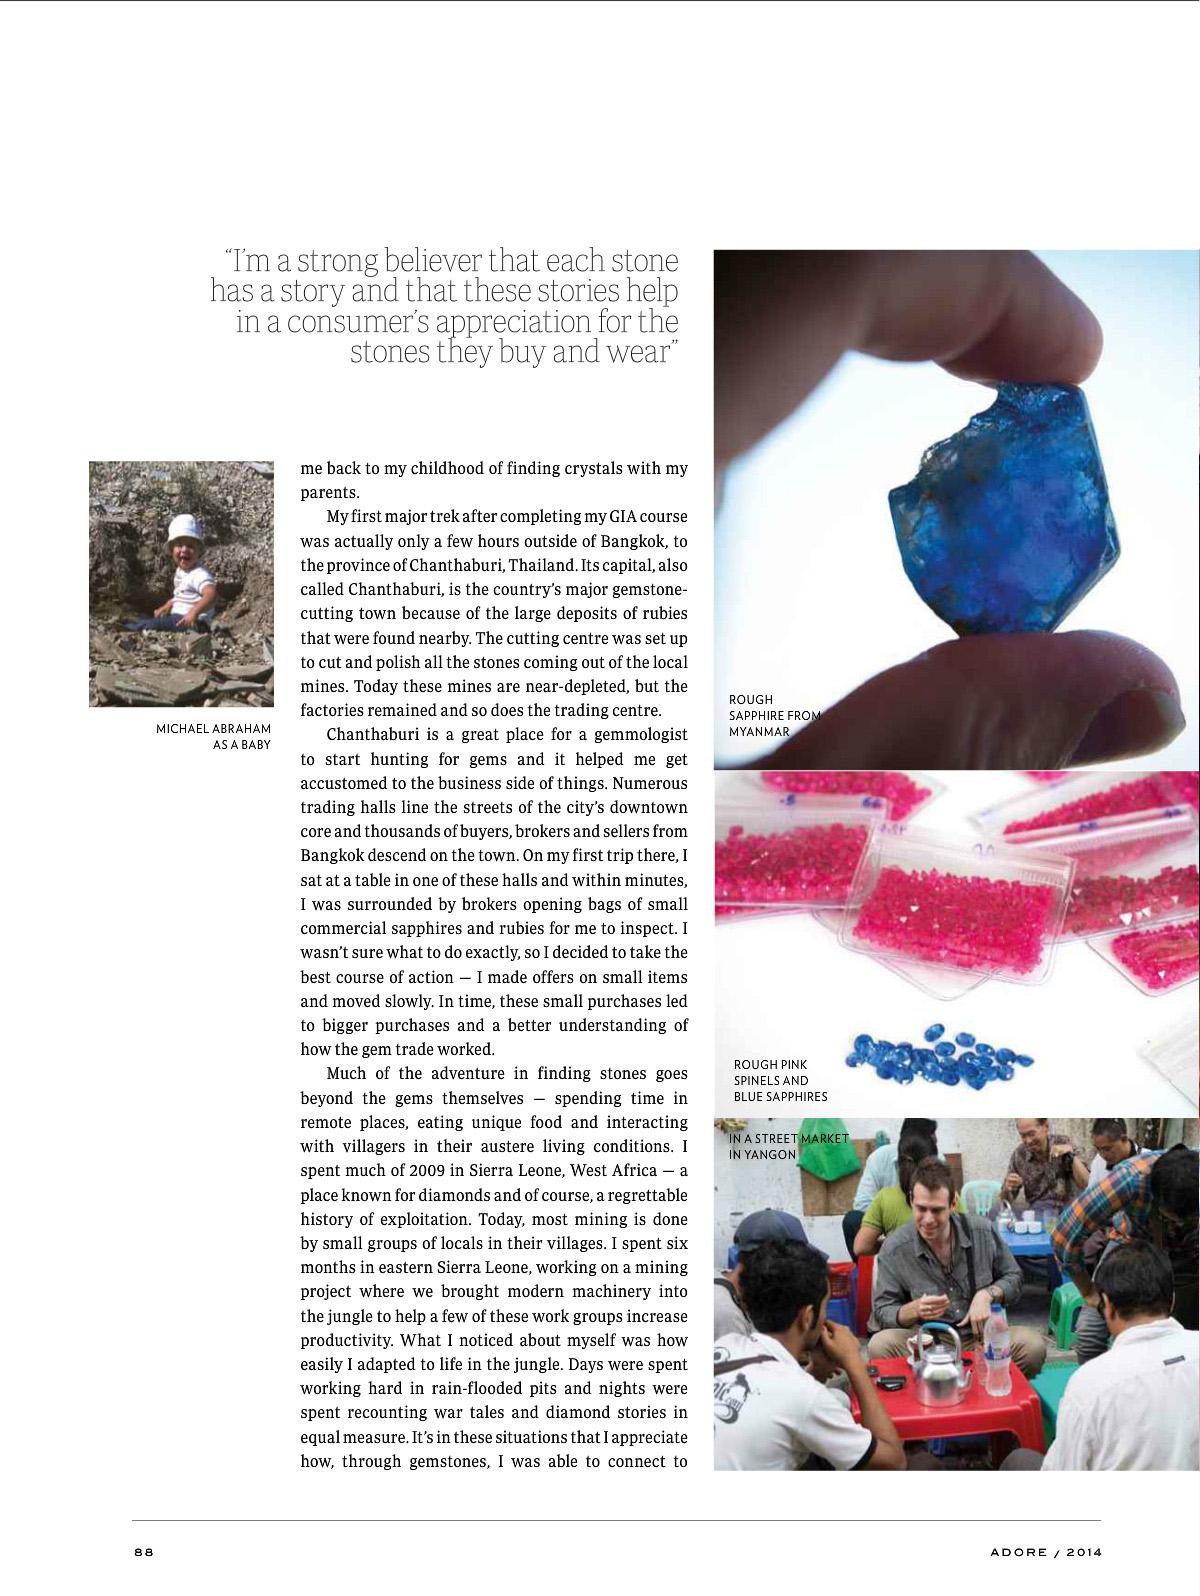 Adore article p3.jpg